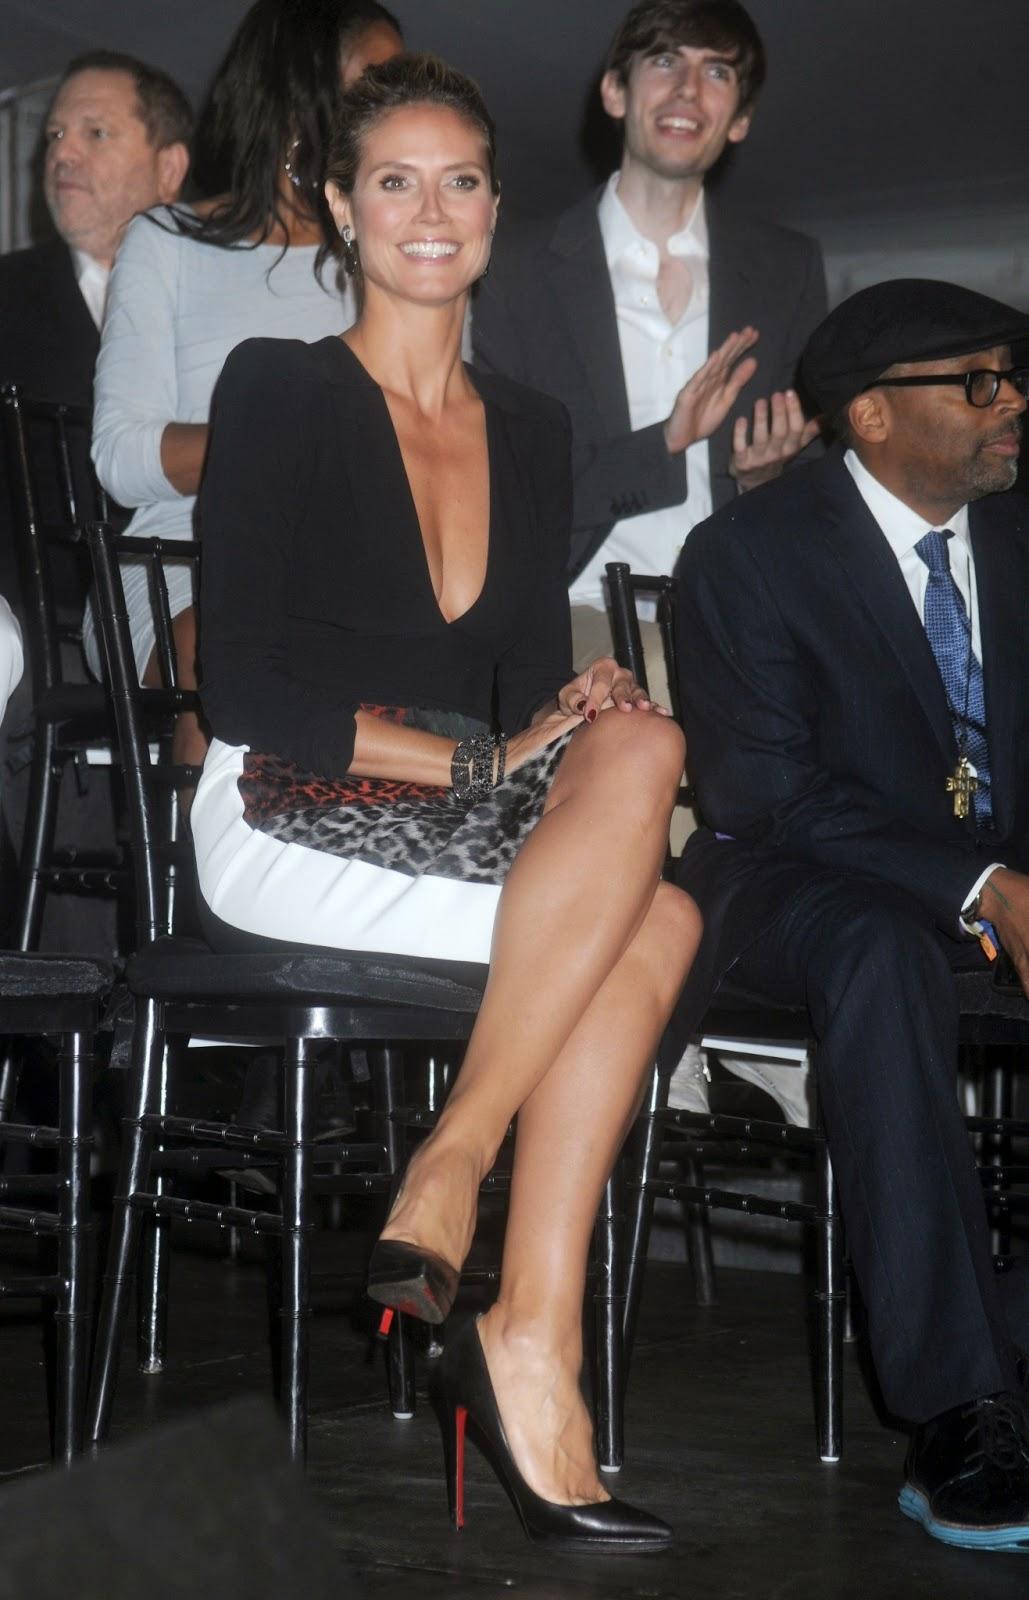 Cleavage Nicolette van Dam naked (43 foto and video), Tits, Is a cute, Boobs, in bikini 2020